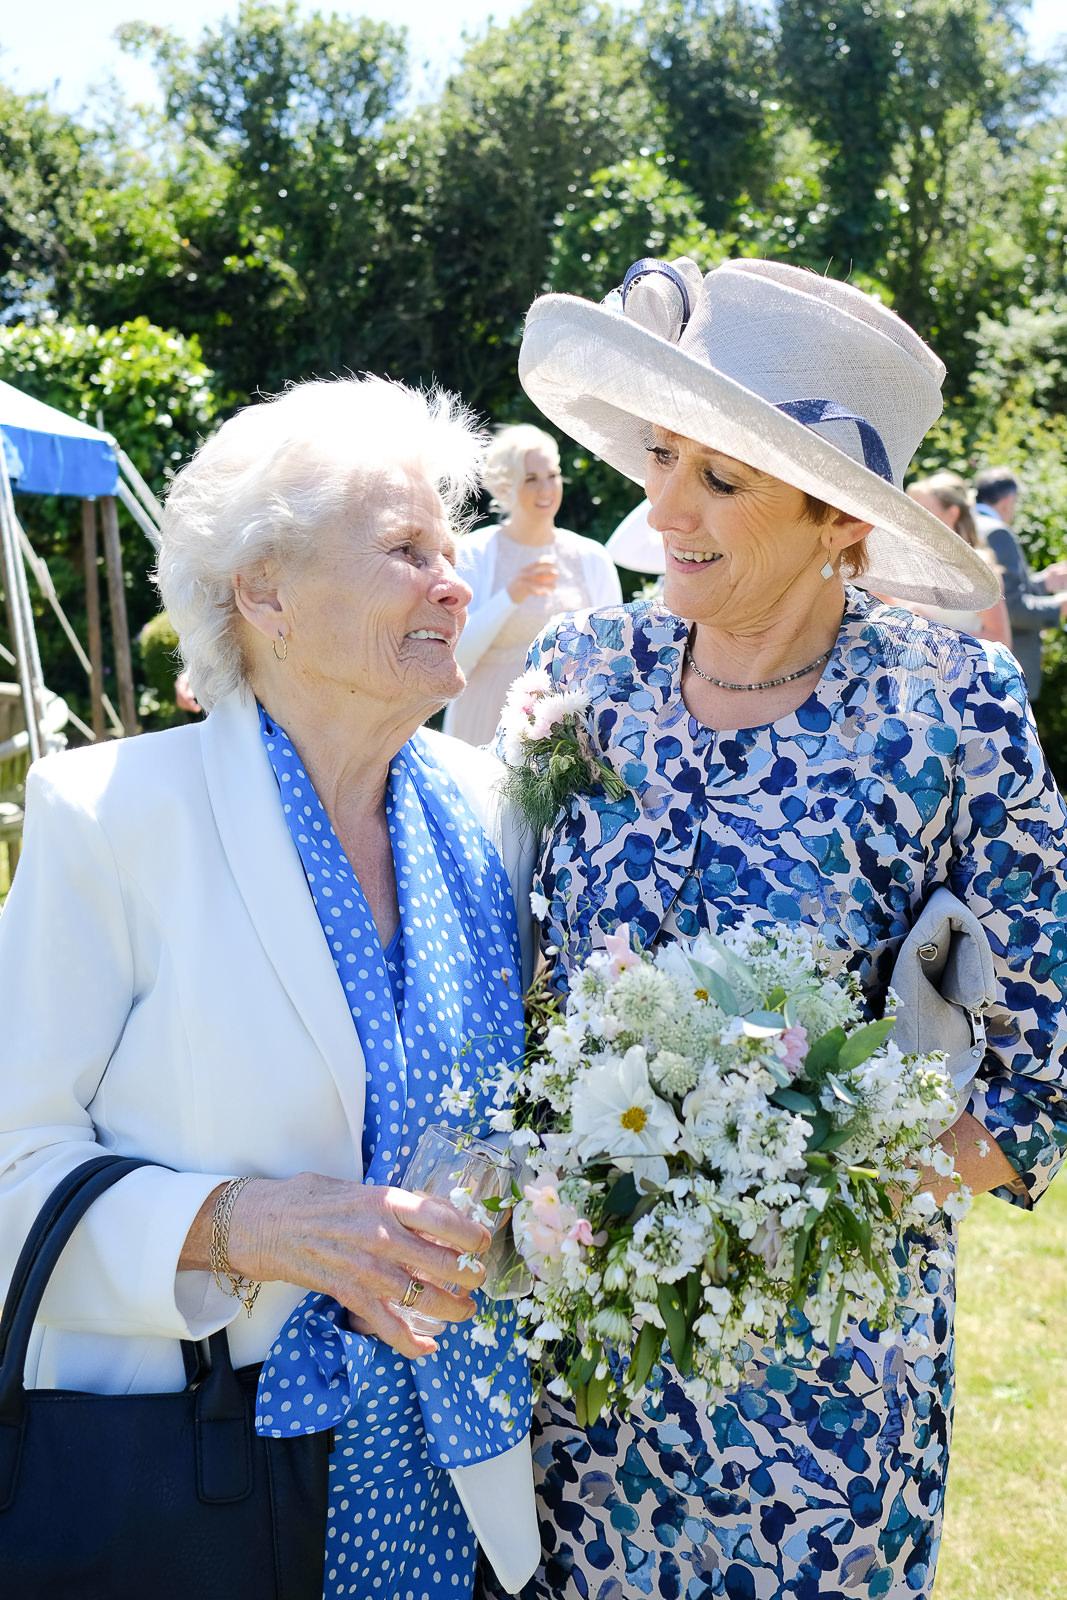 Roscarrock Farm wedding in Cornwall 051.jpg